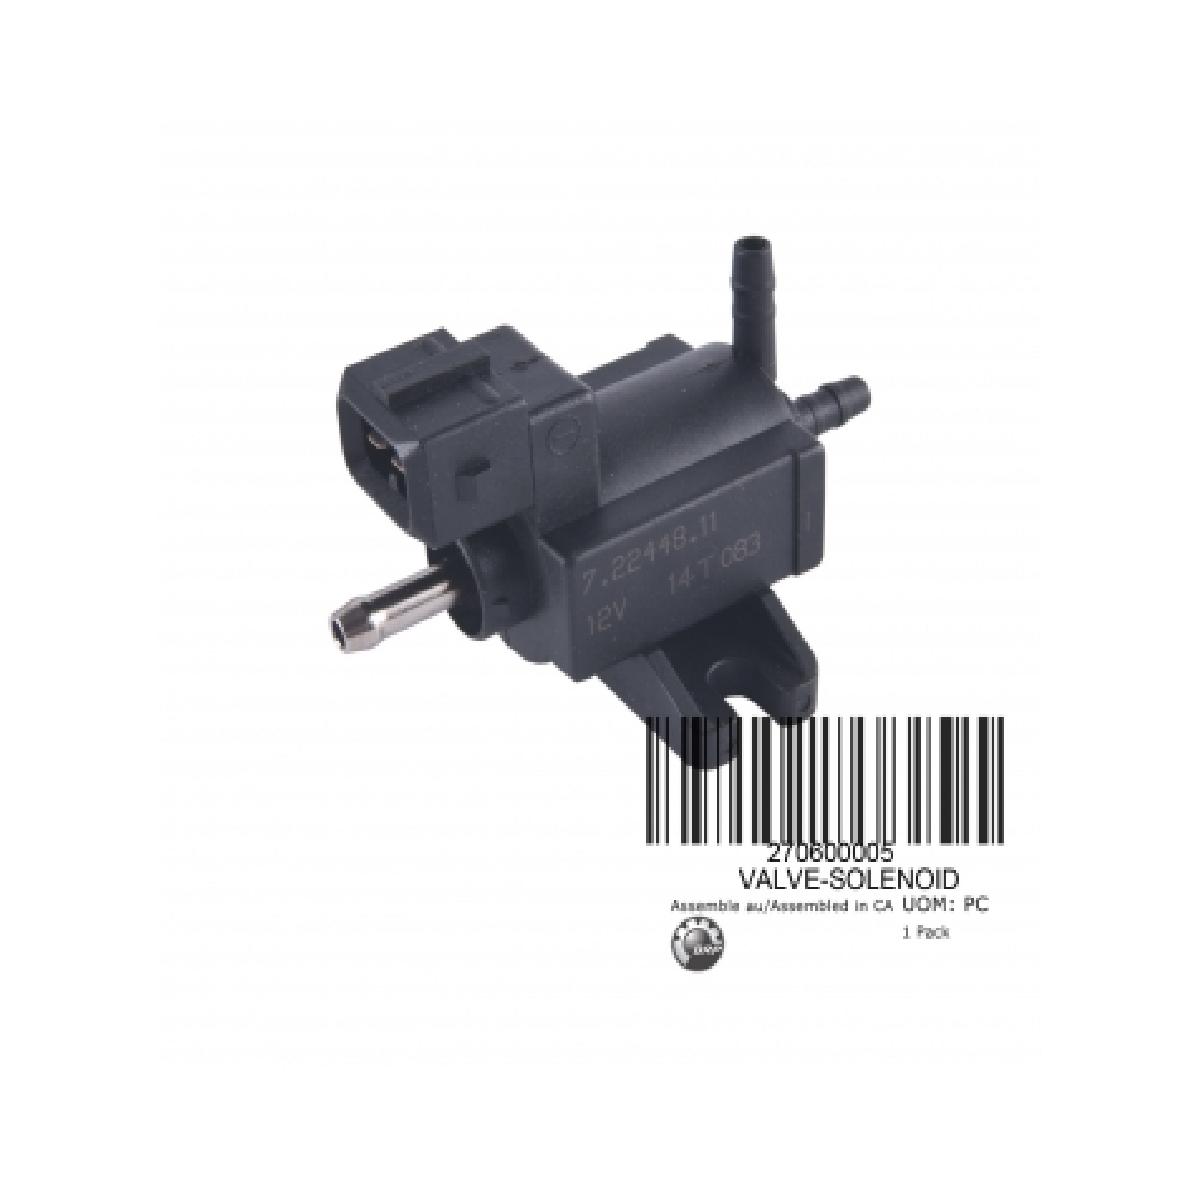 Válvula Solenoide para Jet Ski Sea Doo GSX/GTI/GTX  - Radical Peças - Peças para Jet Ski